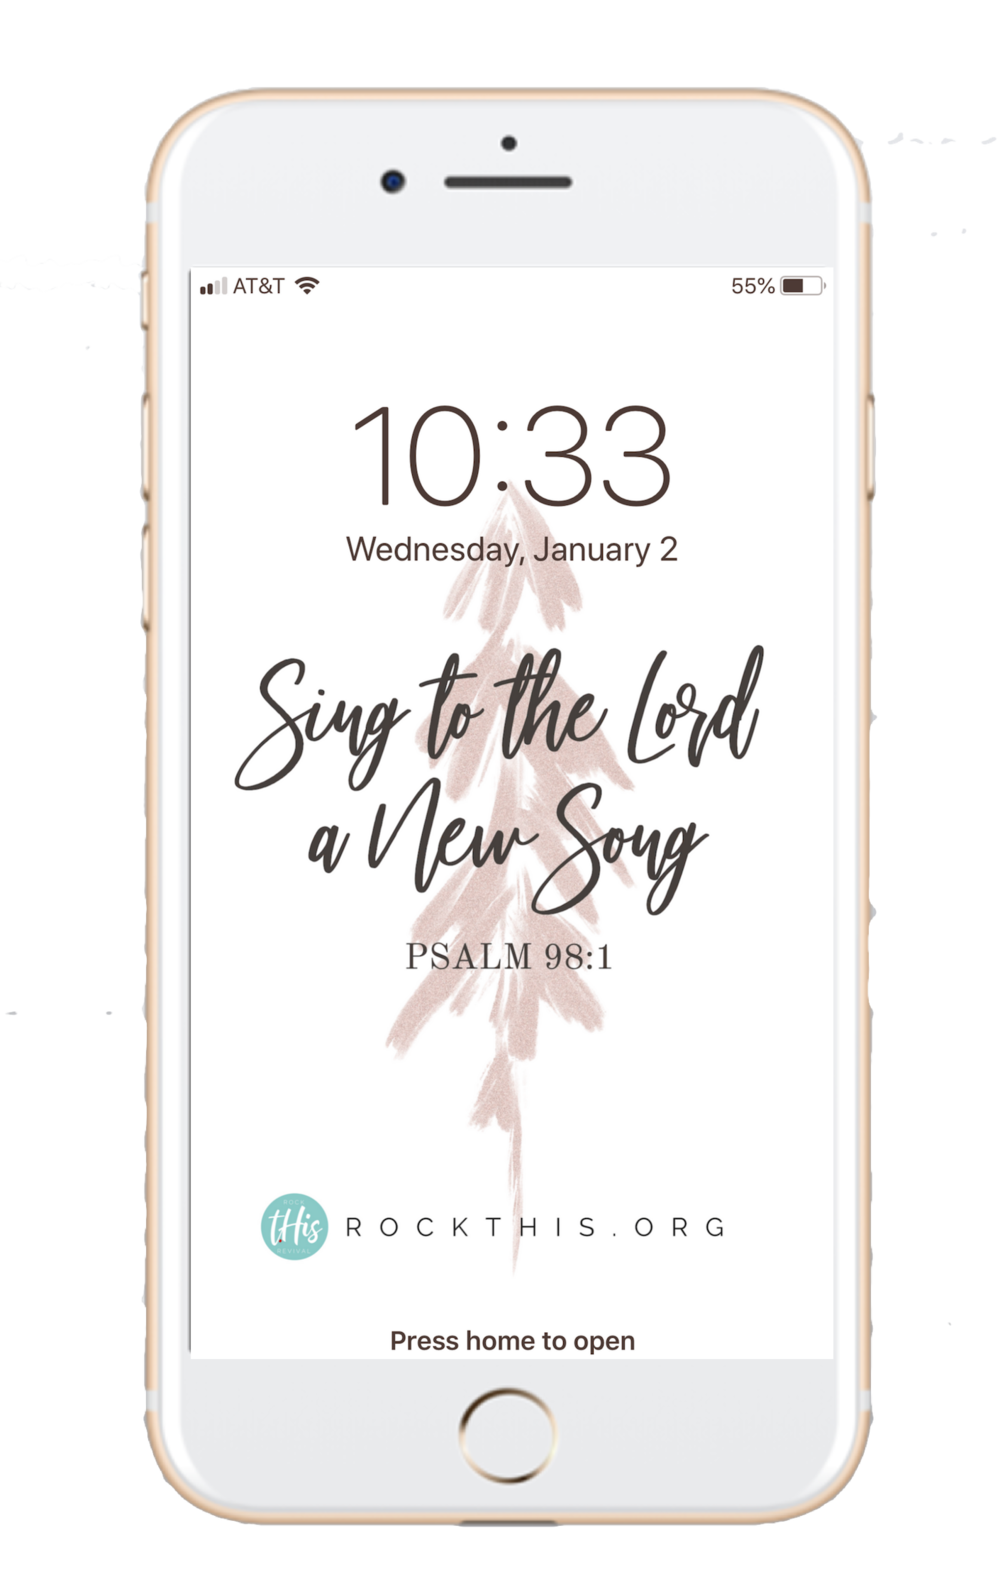 Lock Screens | Free Lock Screens | Sing the Lord a new song #rockthisrevival #scripture #lockscreen